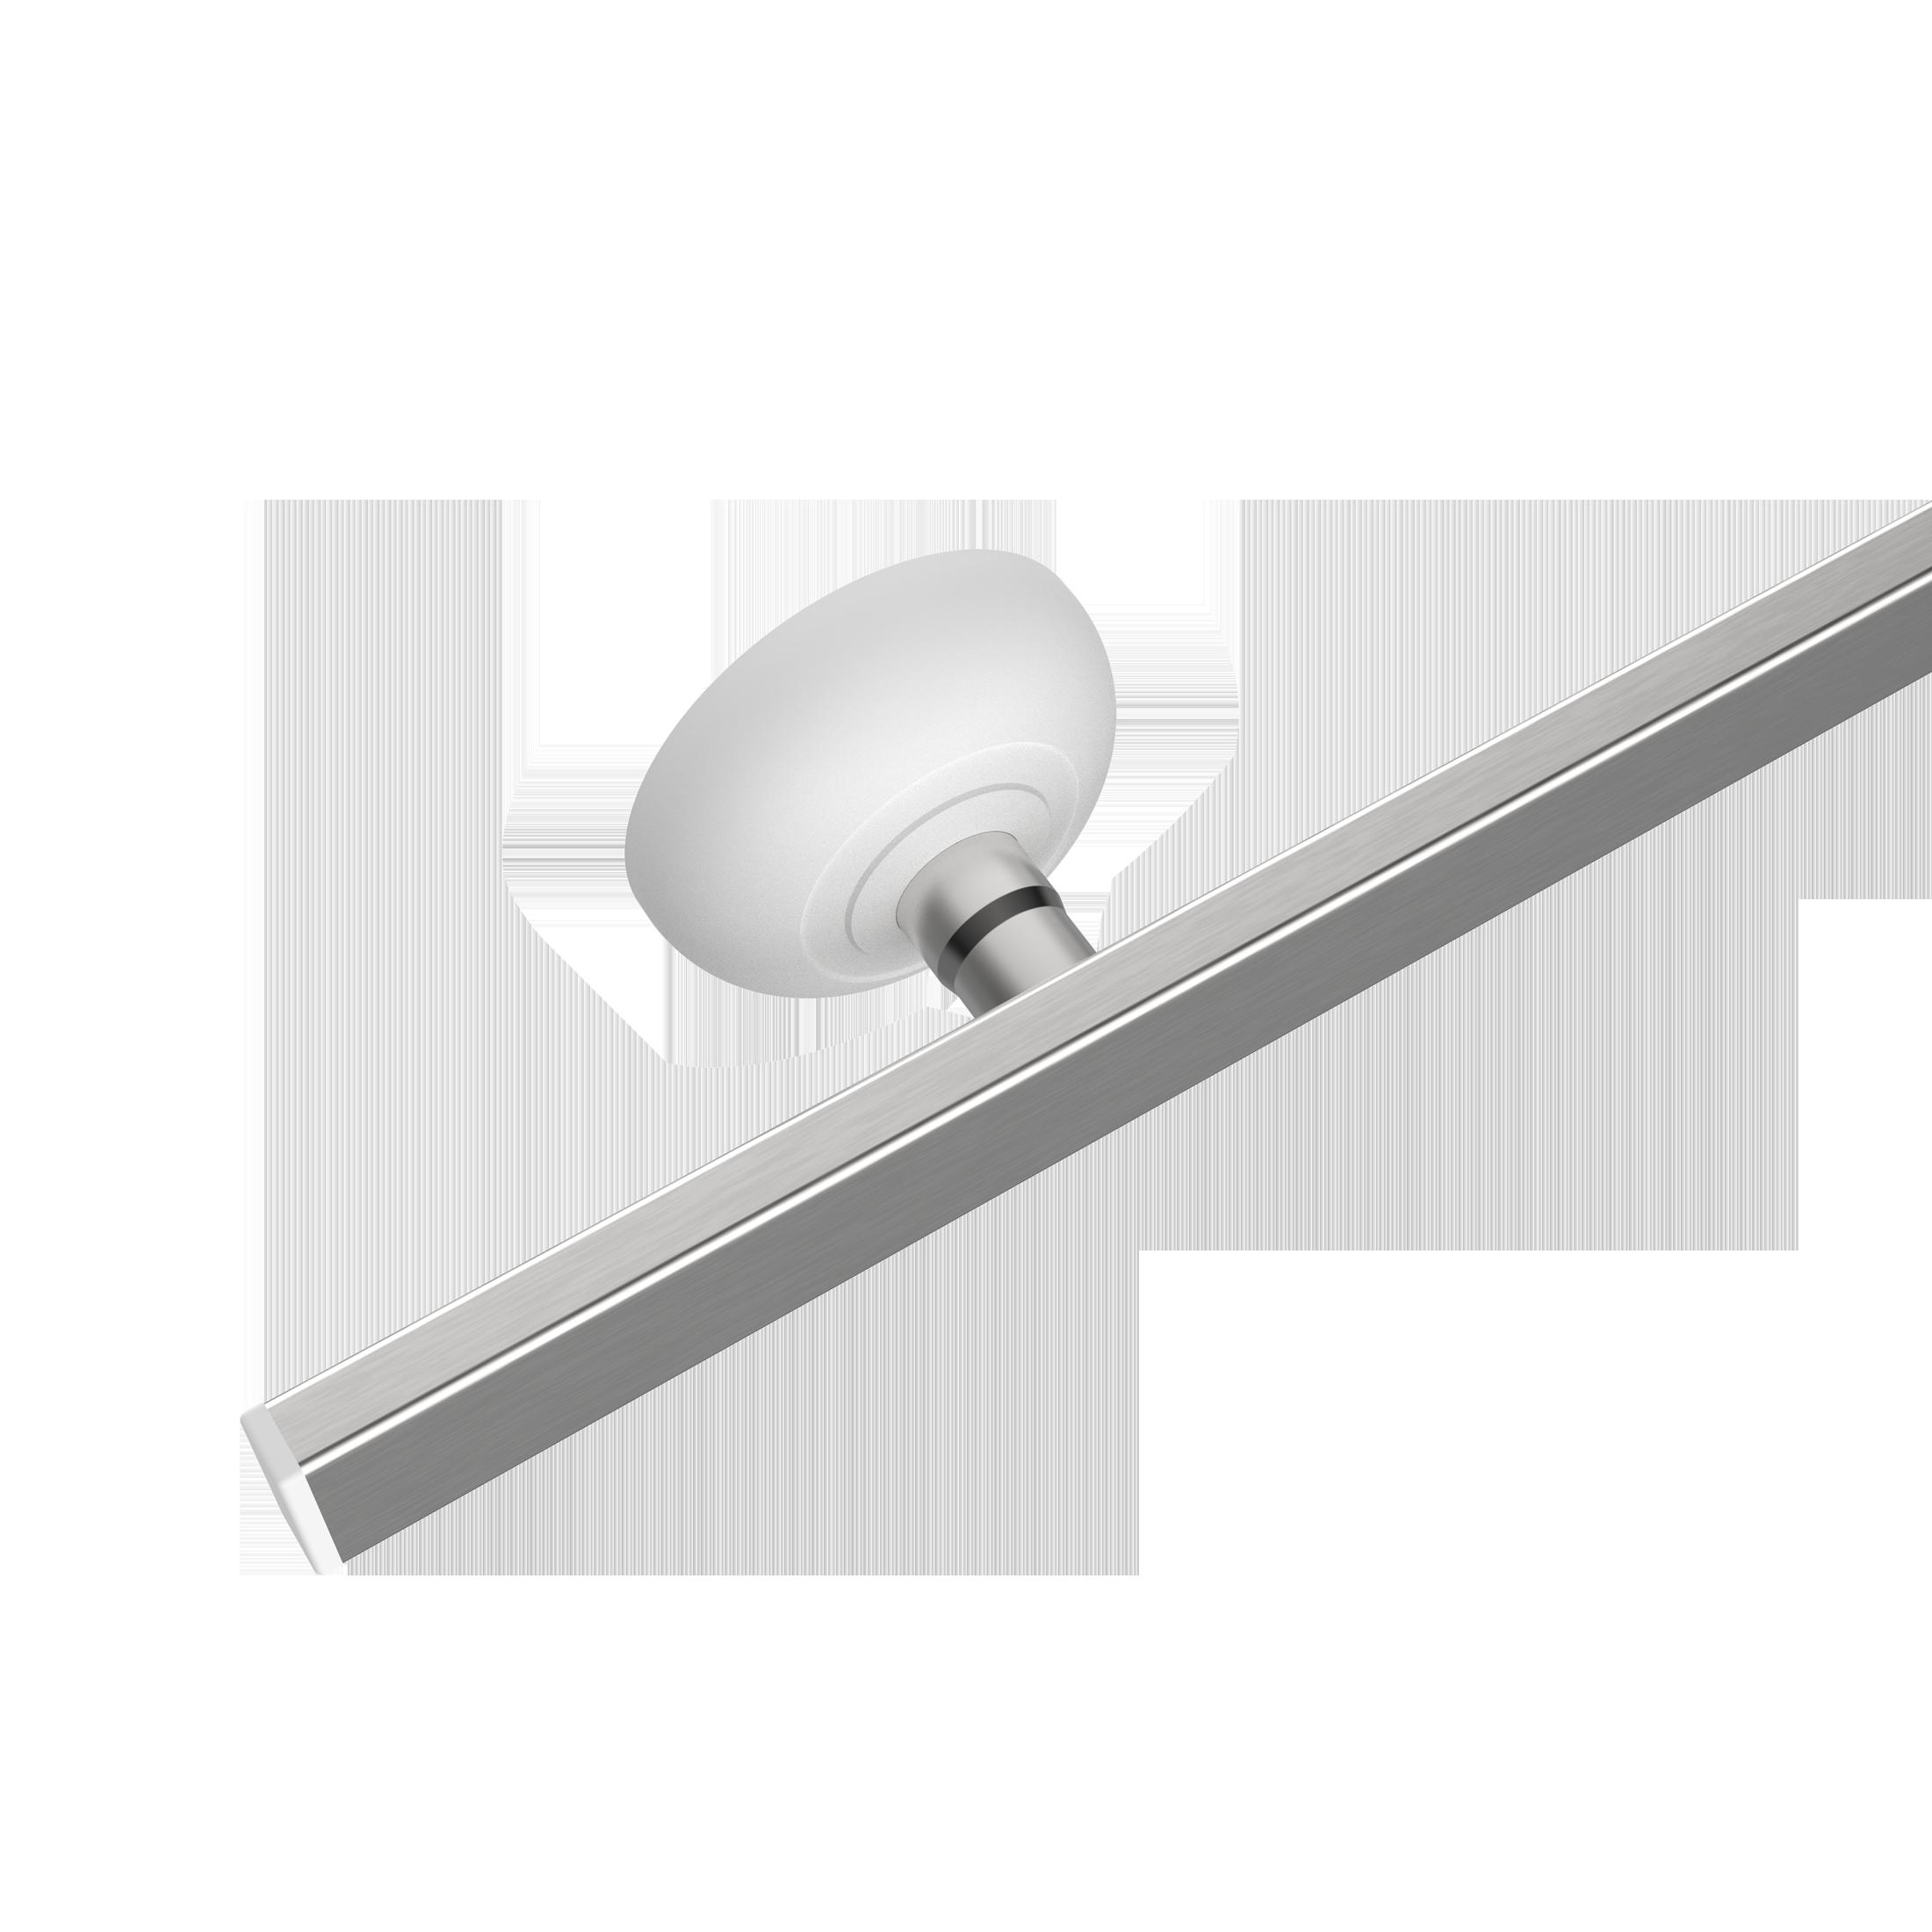 Wandschiene (Geräteschiene)